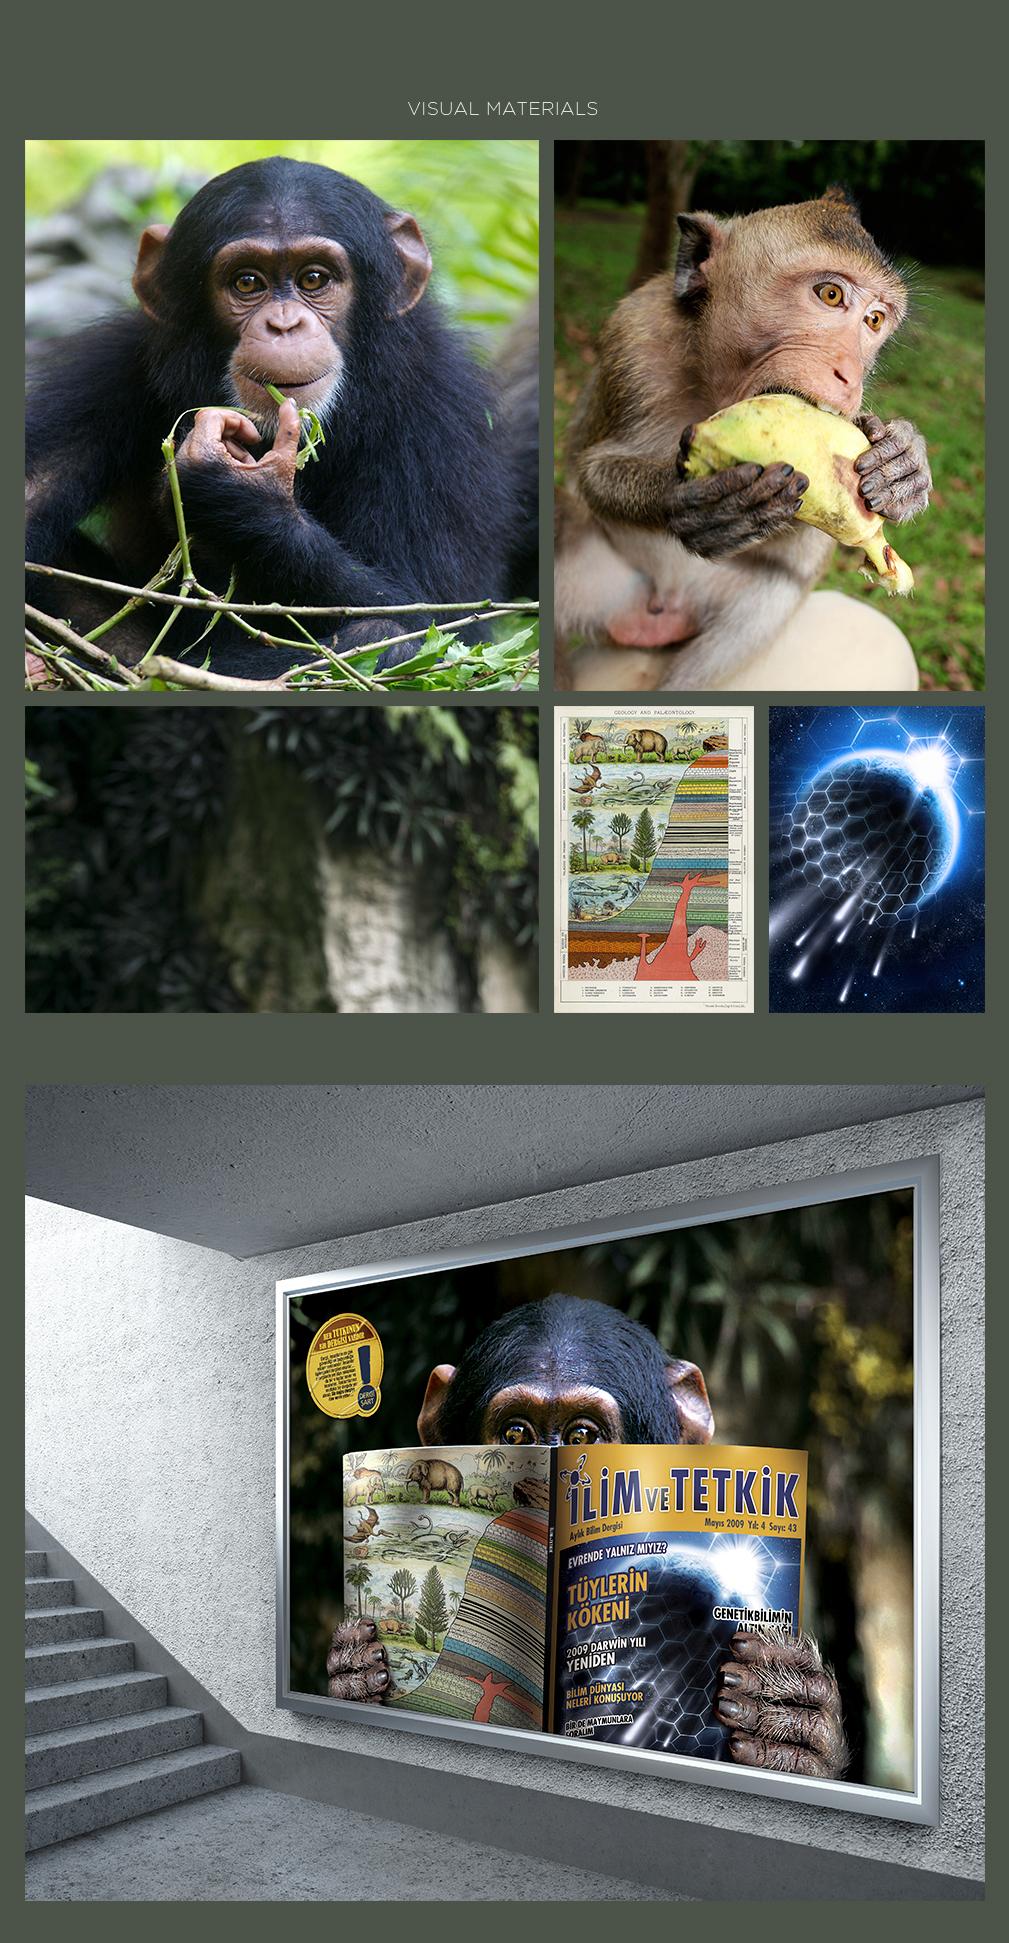 dergi şart retouch magazine print ad lion monkey